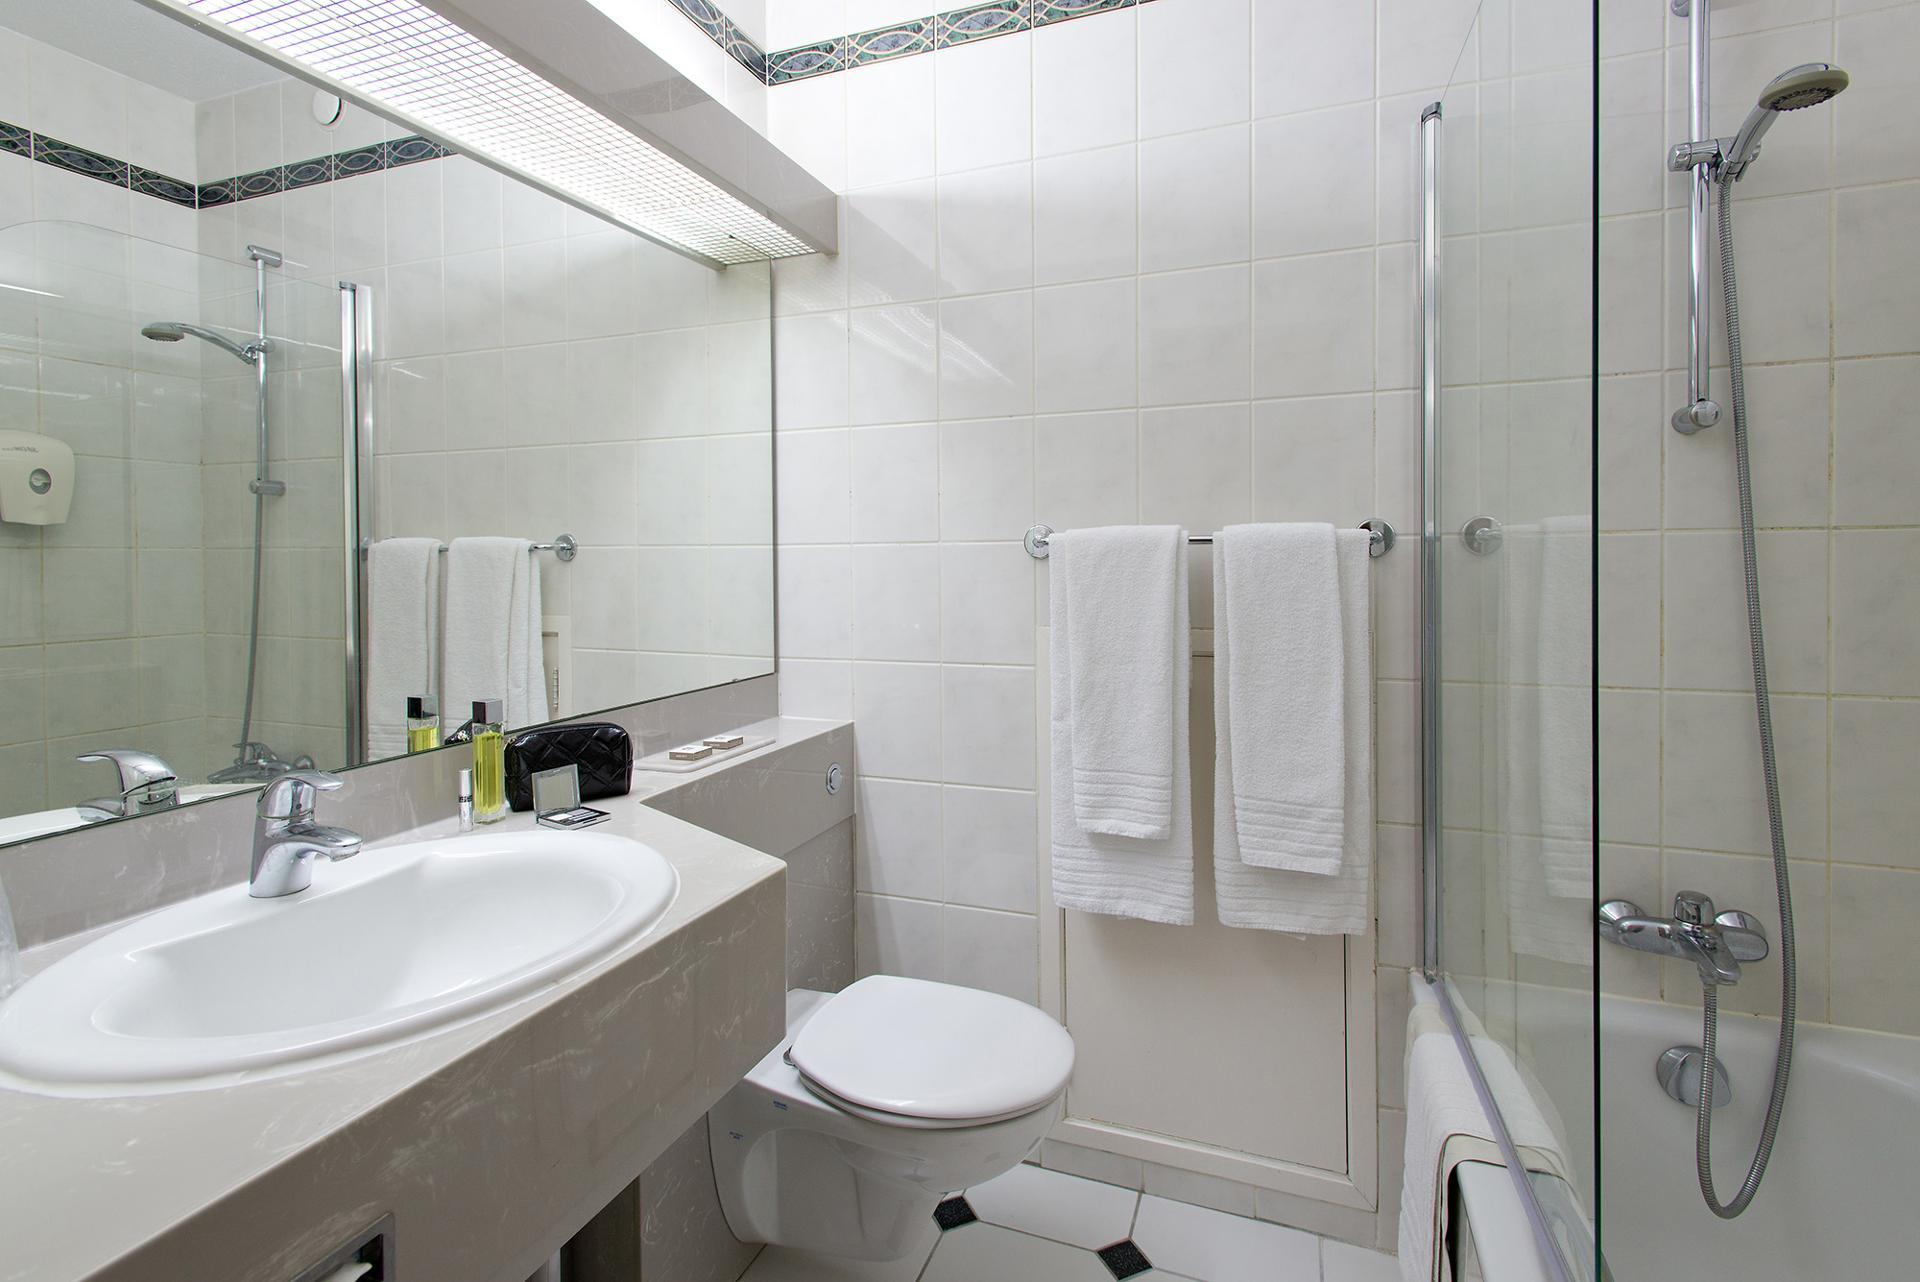 Globales Post Hôtel & Wellness - Herstal - Salle de bains